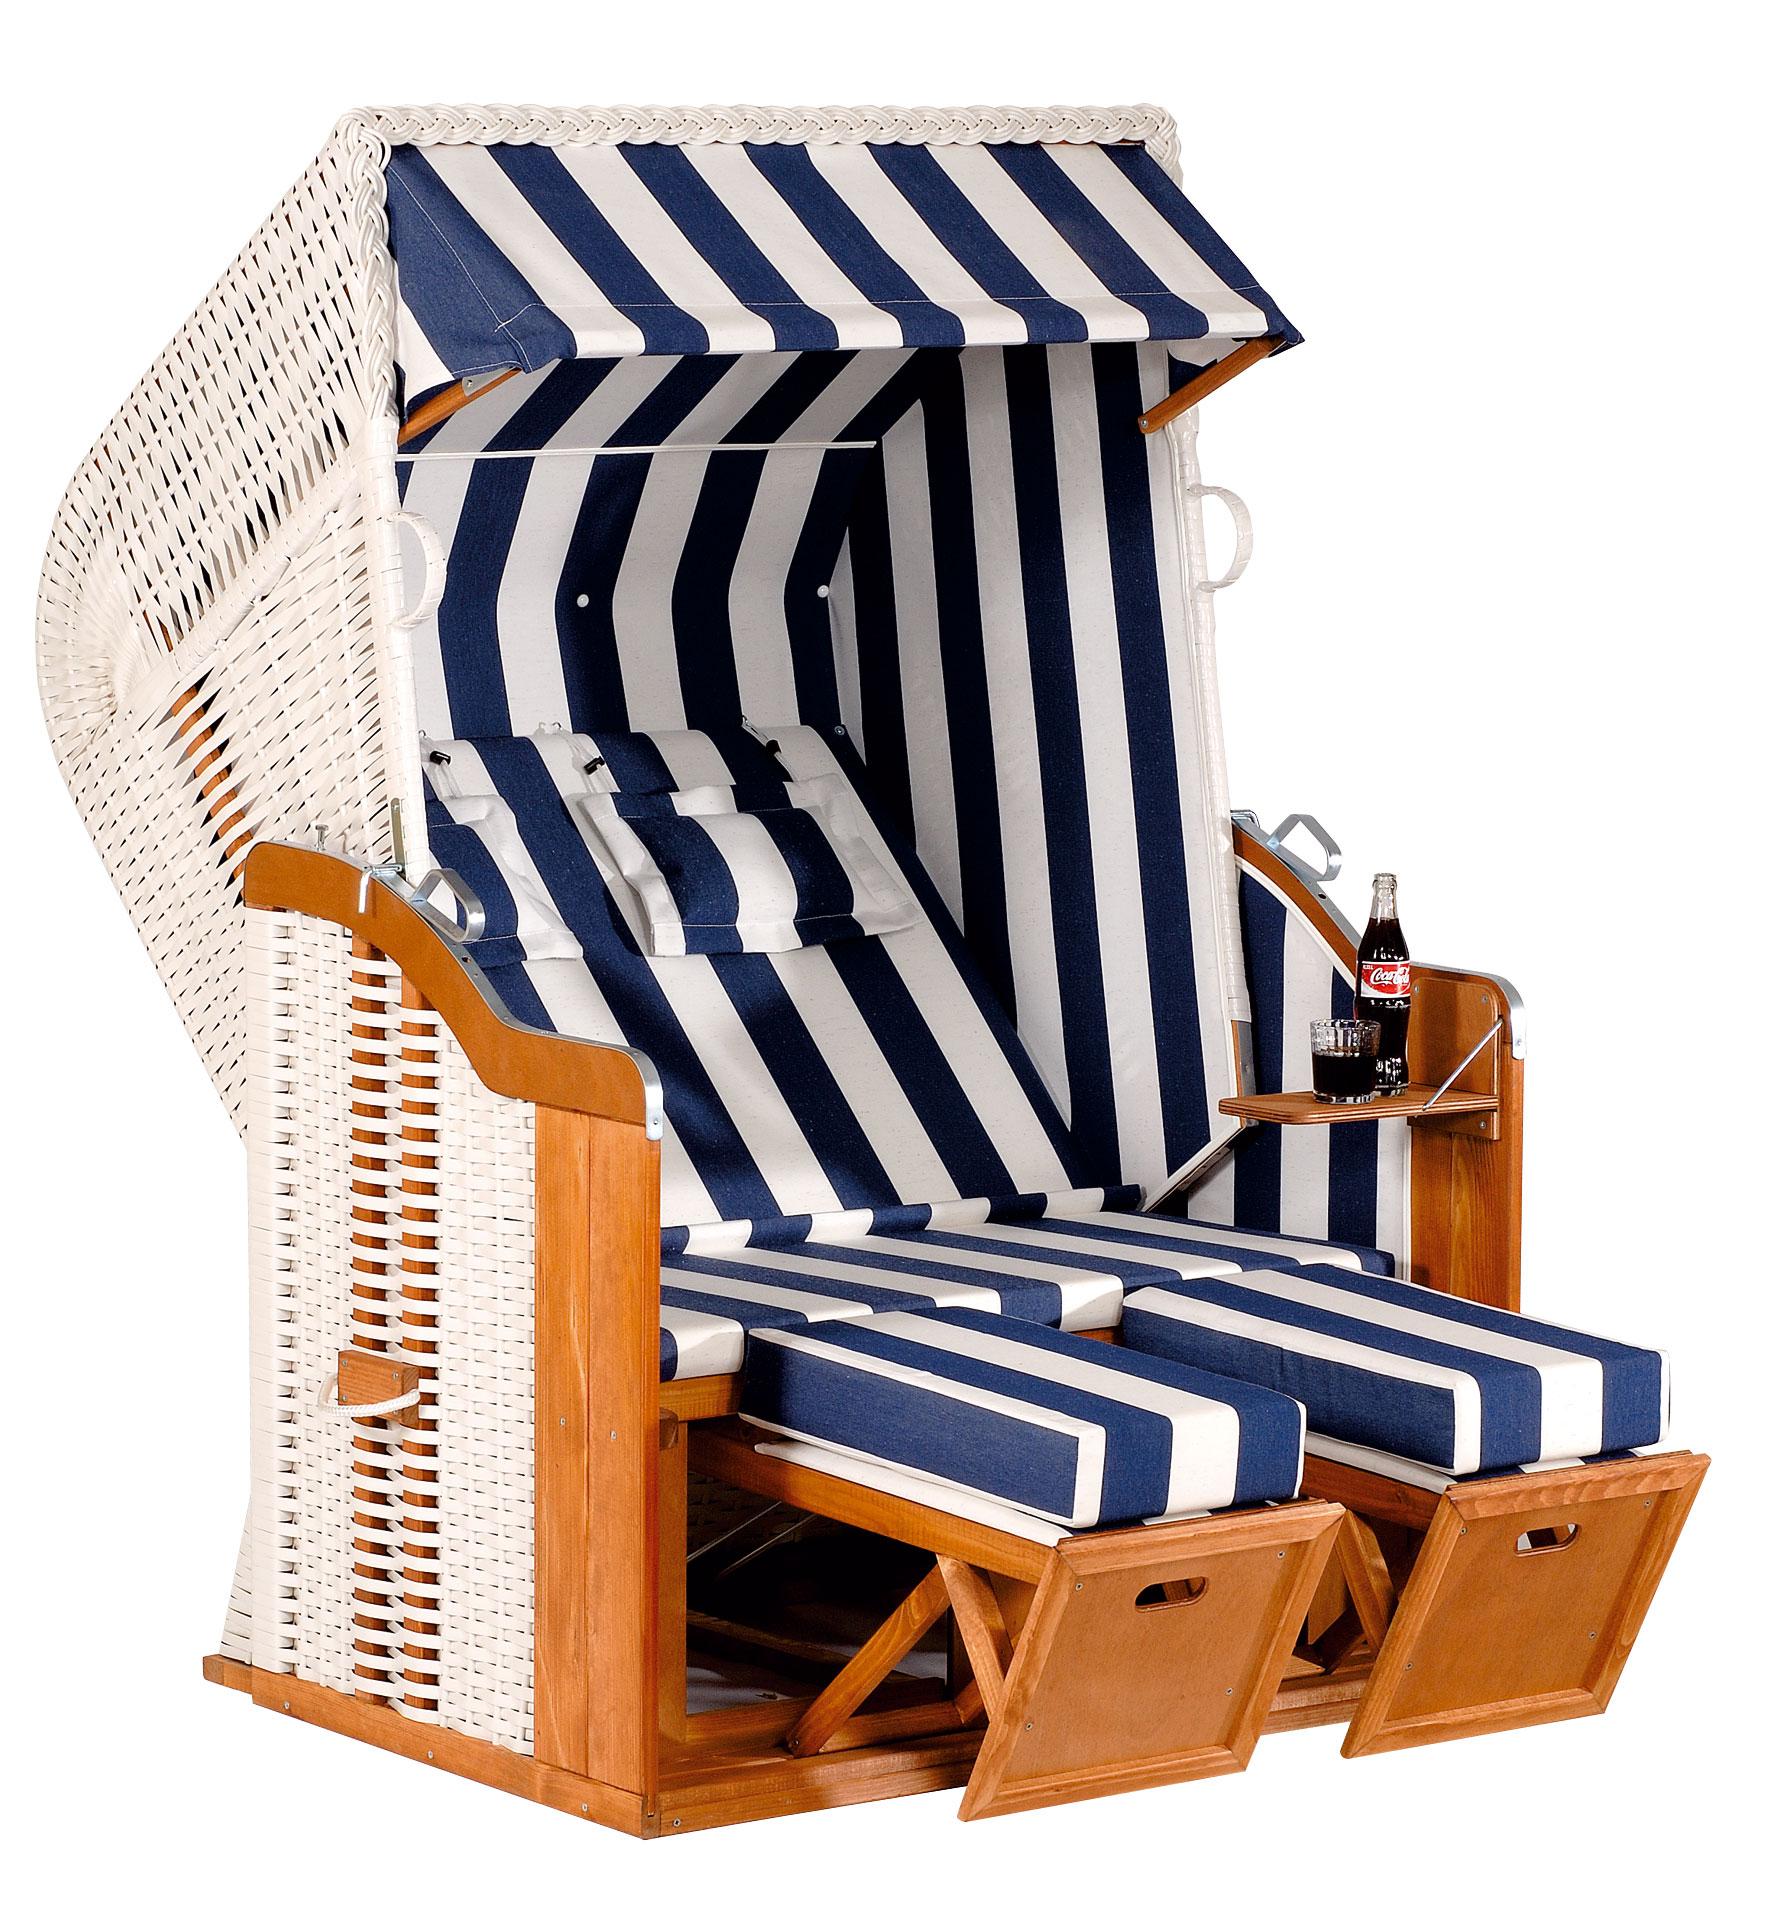 Sunny Smart Strandkorb Liegemodell Rustikal 250 Plus Geflecht weiß 80 Bild 1